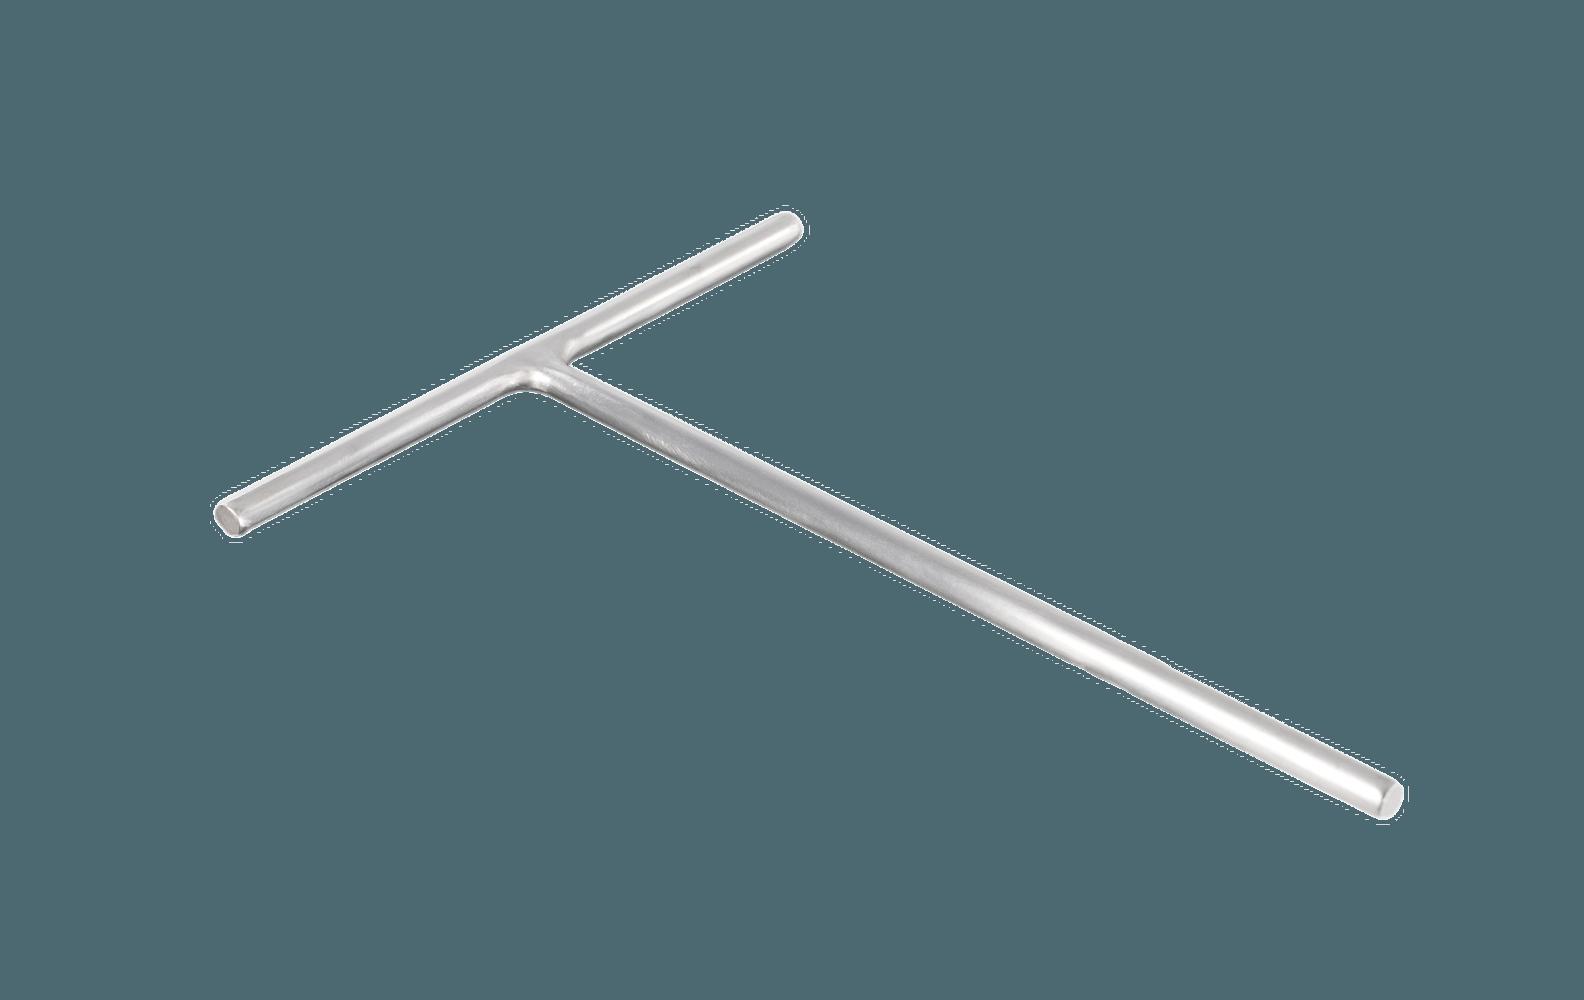 Râteau ultra léger | Orca Distri